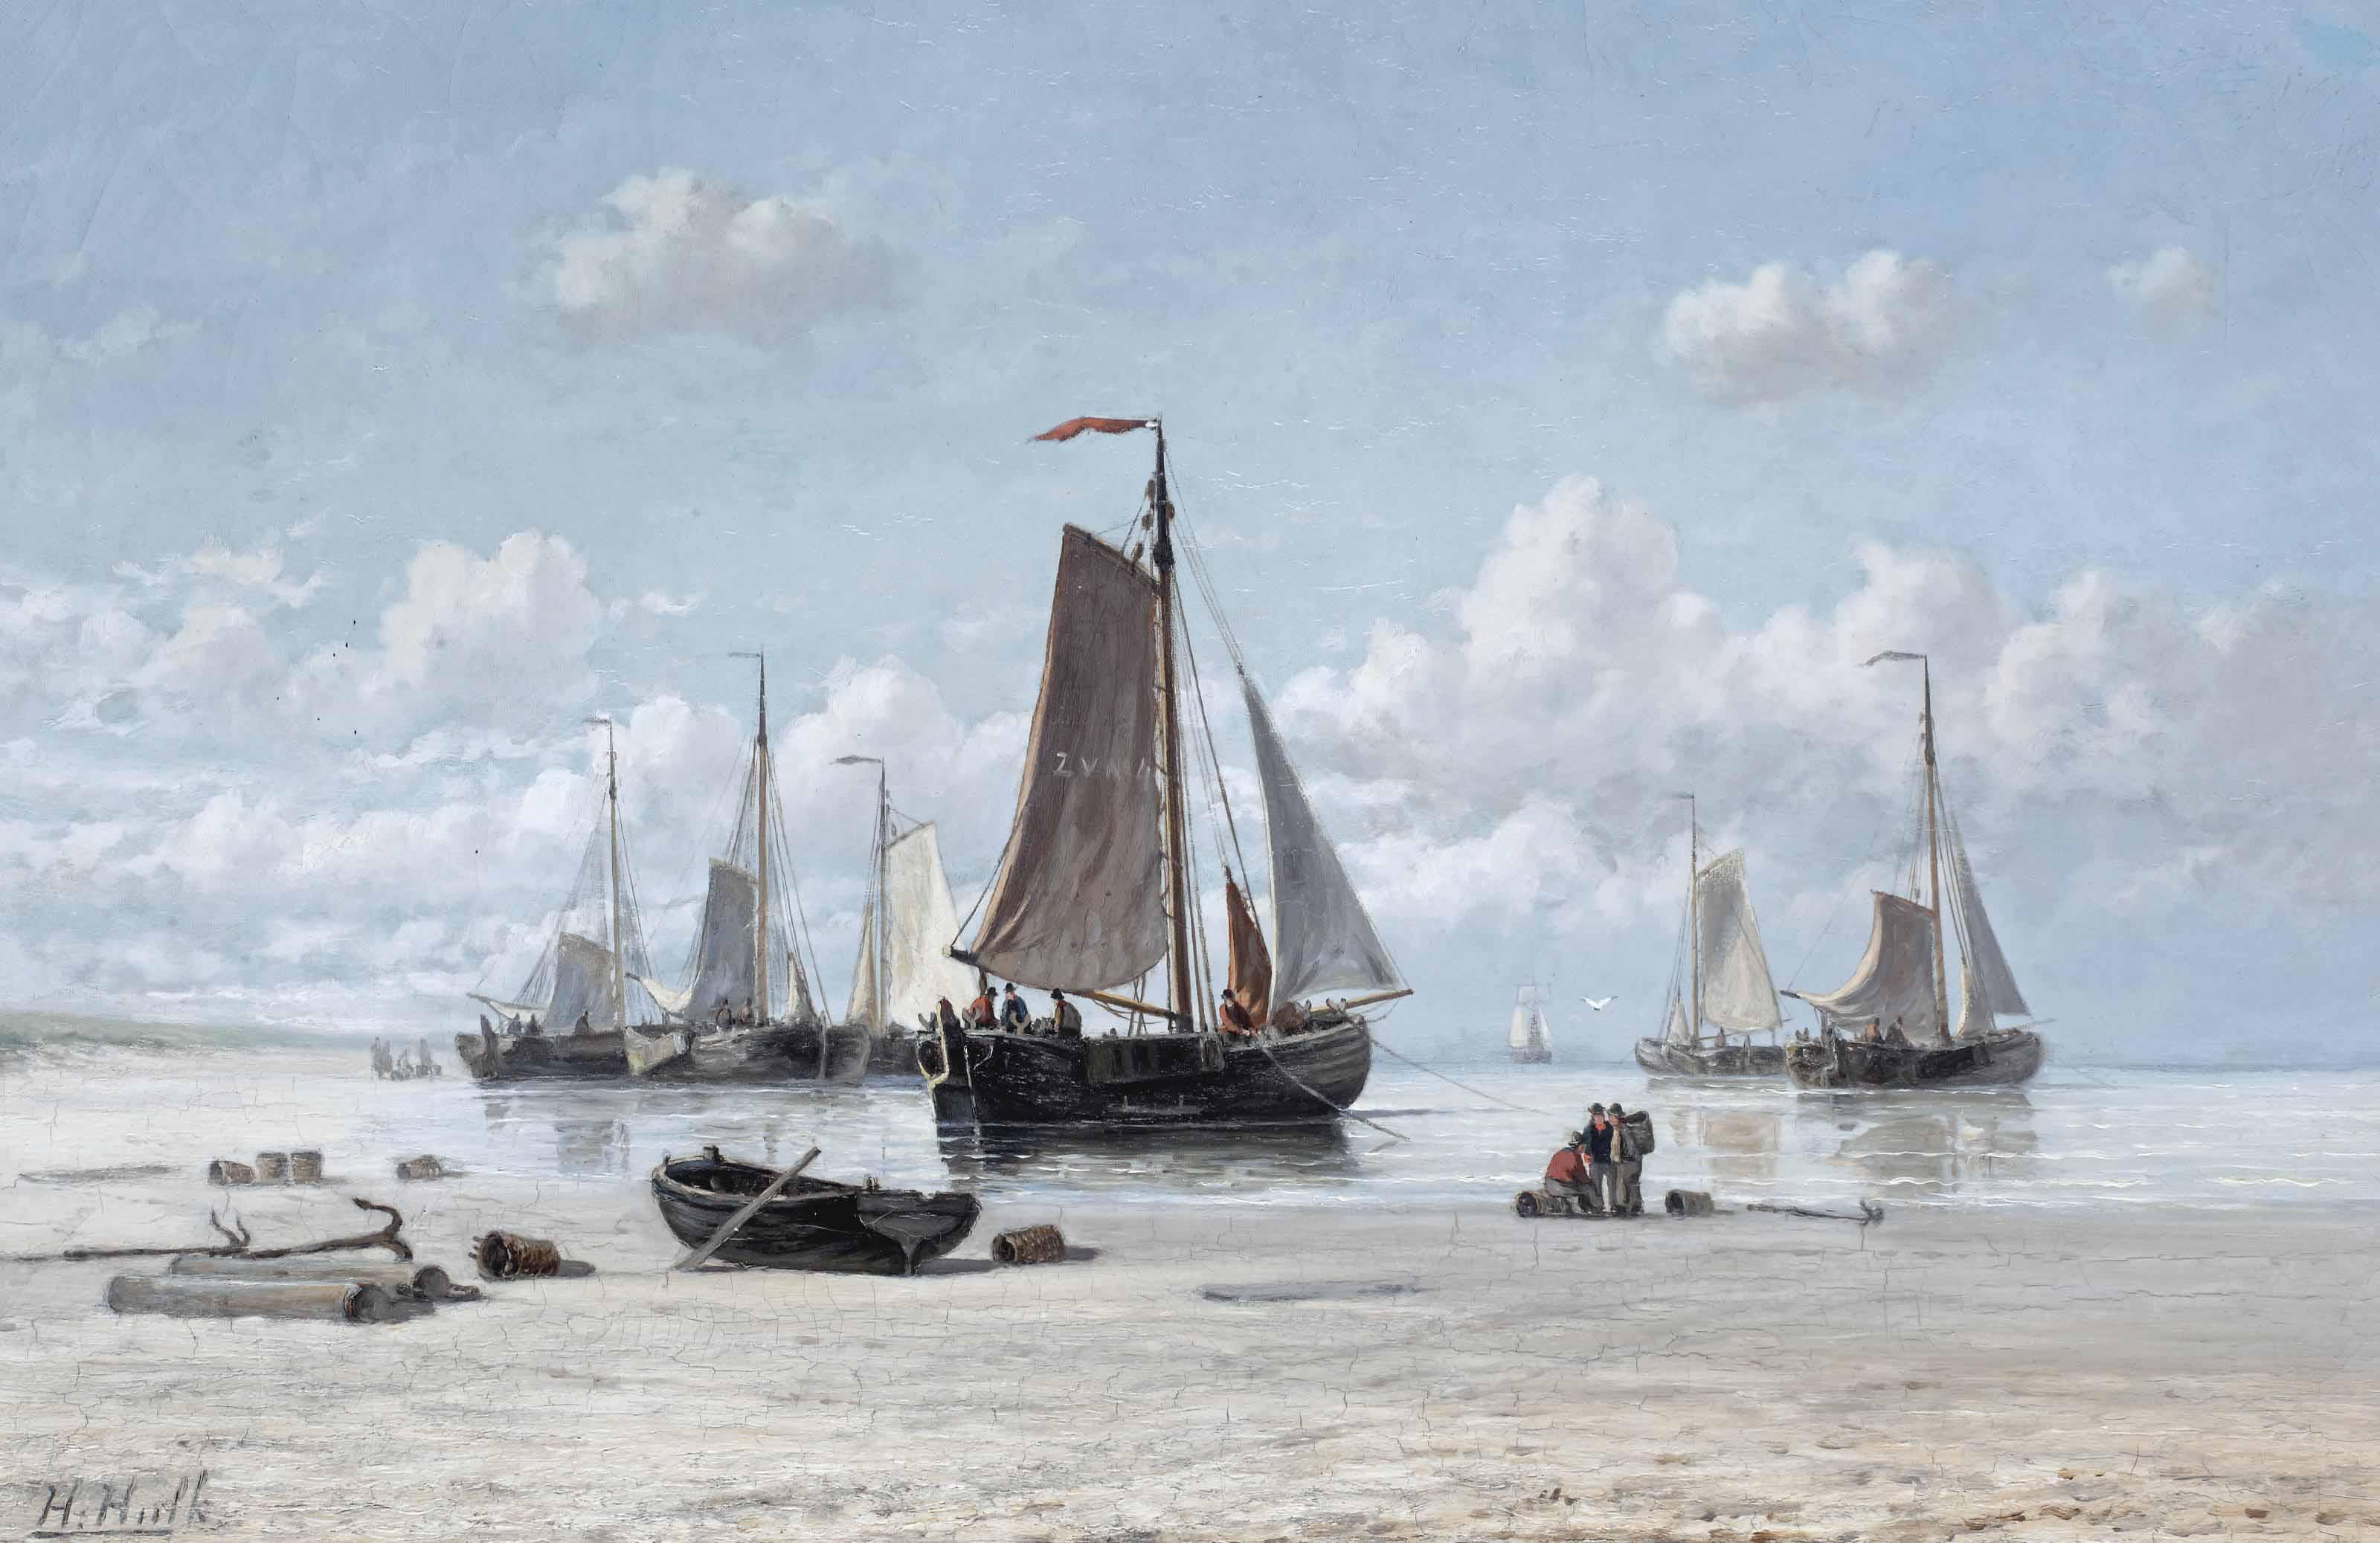 Fishing vessels on the beach, Zandvoort